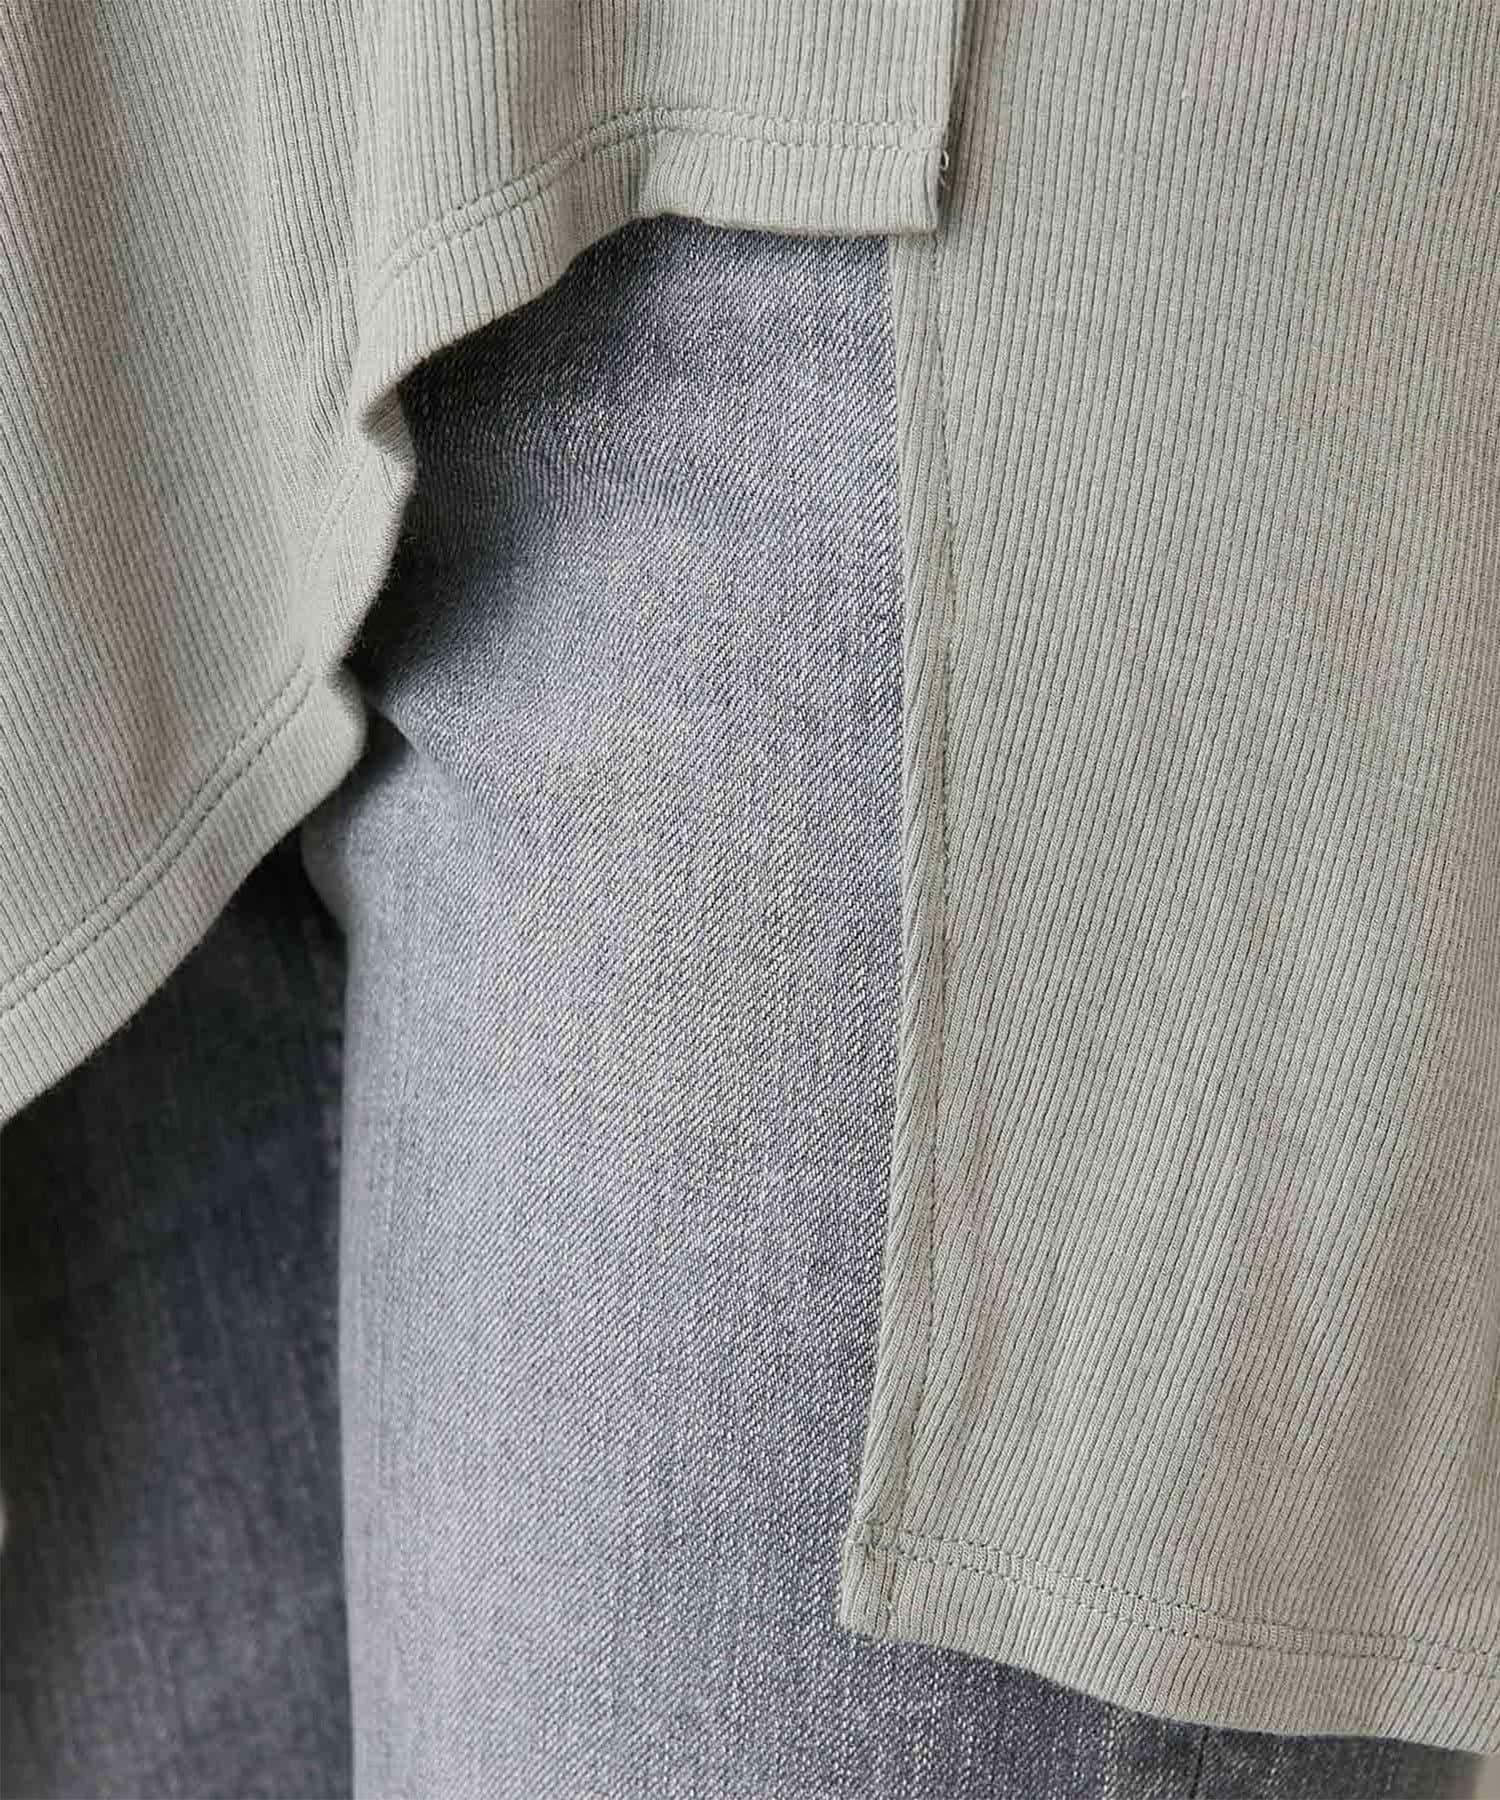 GALLARDAGALANTE(ガリャルダガランテ) イレギュラーヘムカットソー【オンラインストア限定商品】